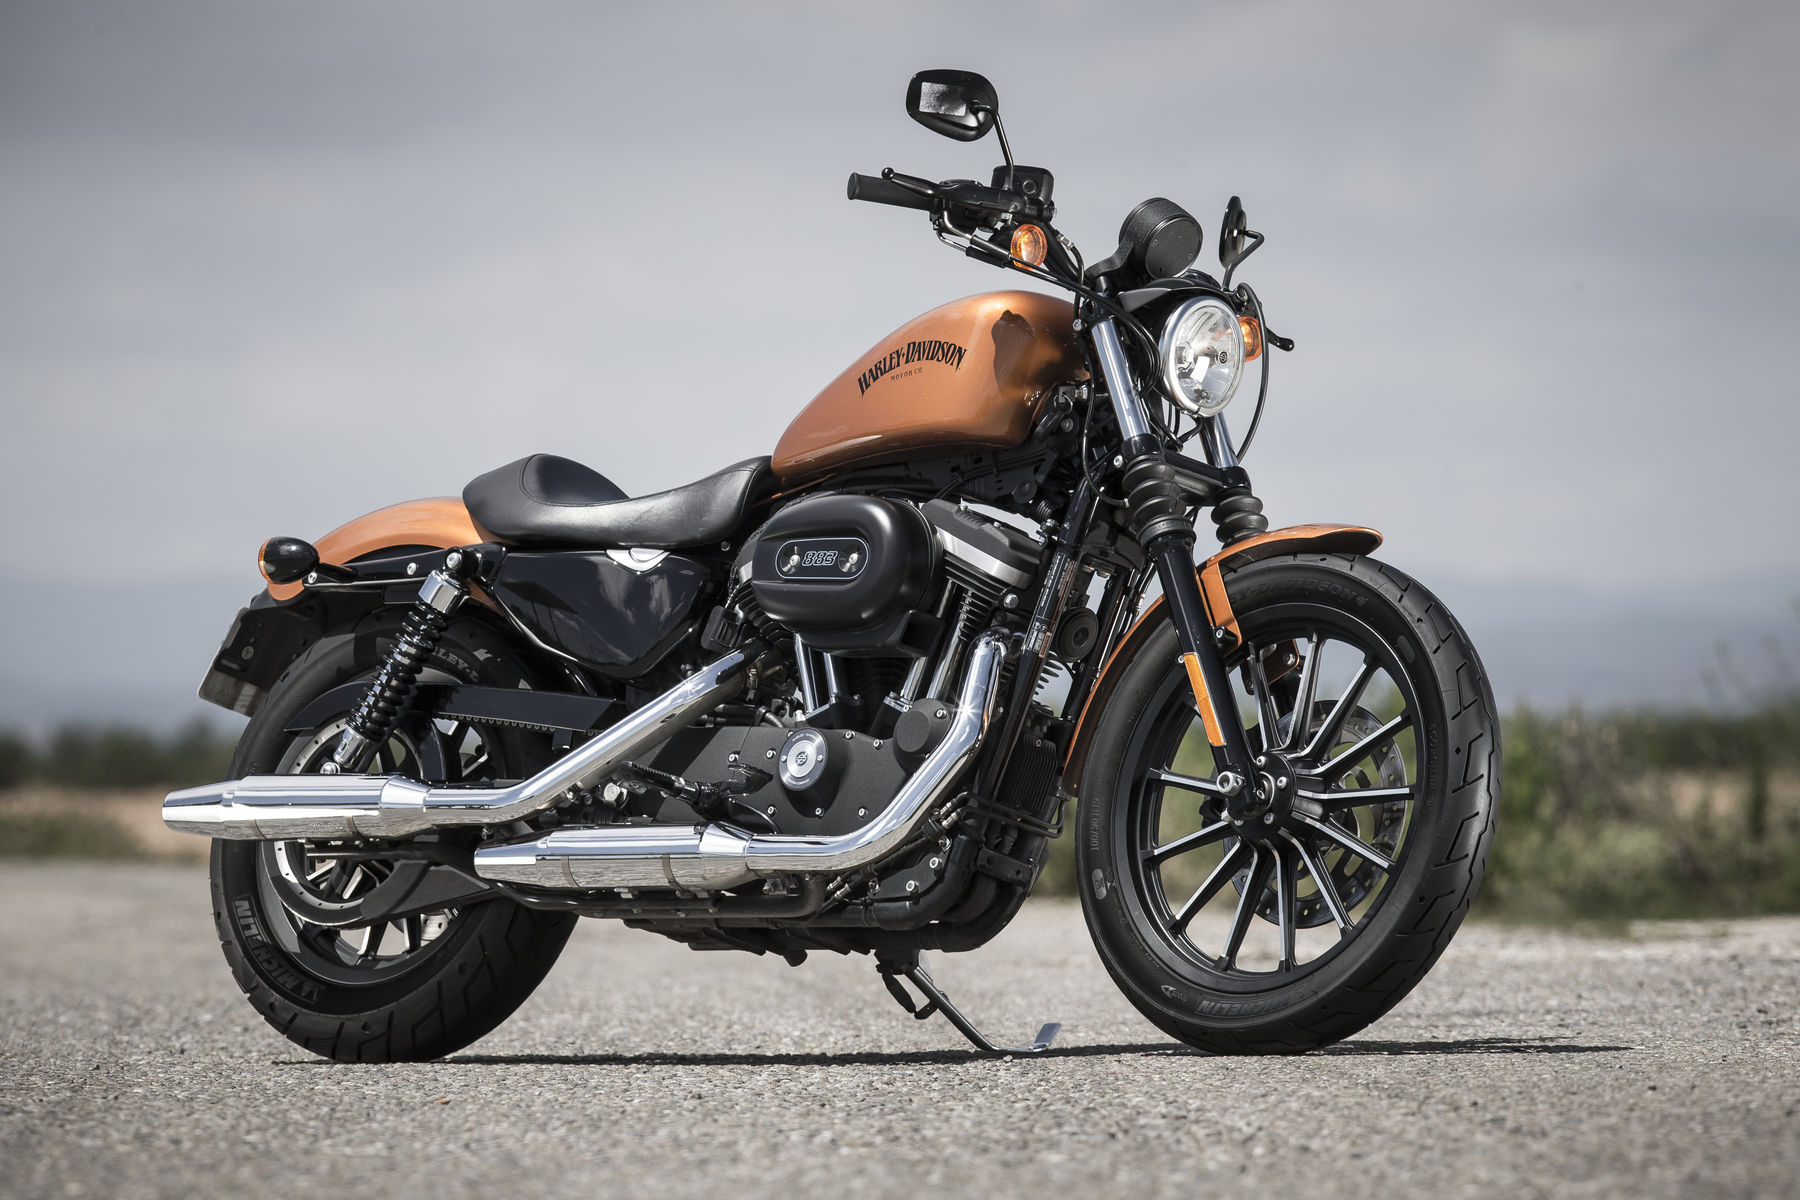 Harley-Davidson XL883N IRON   Harley-Davidson Iron 883